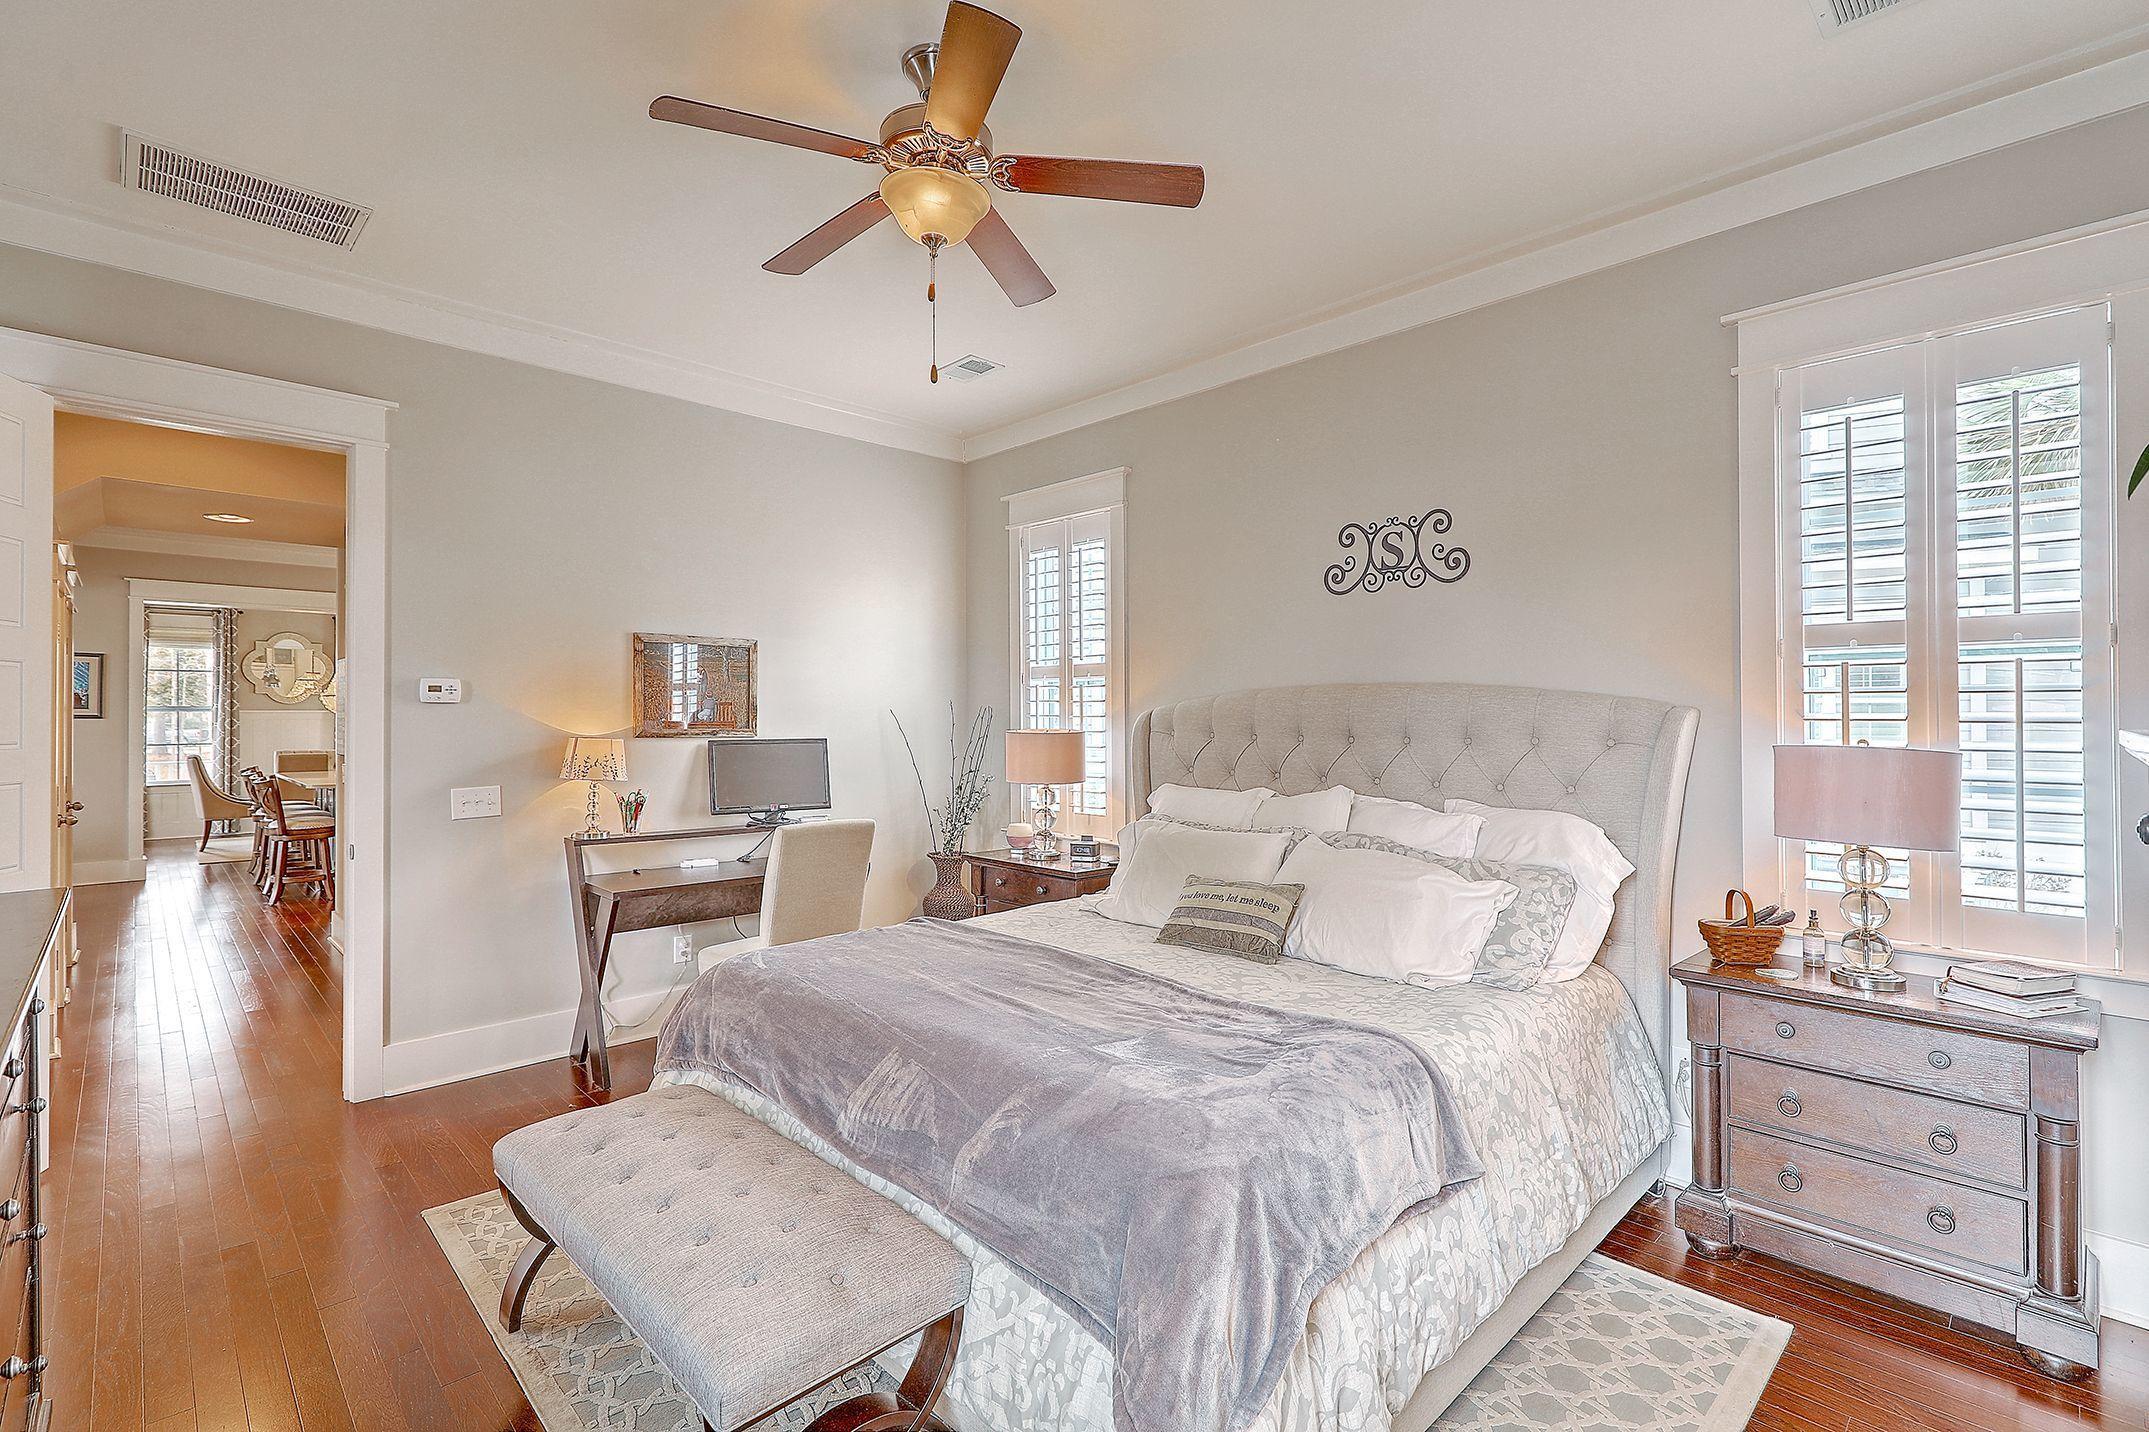 Carolina Park Homes For Sale - 1549 Eastham, Mount Pleasant, SC - 0